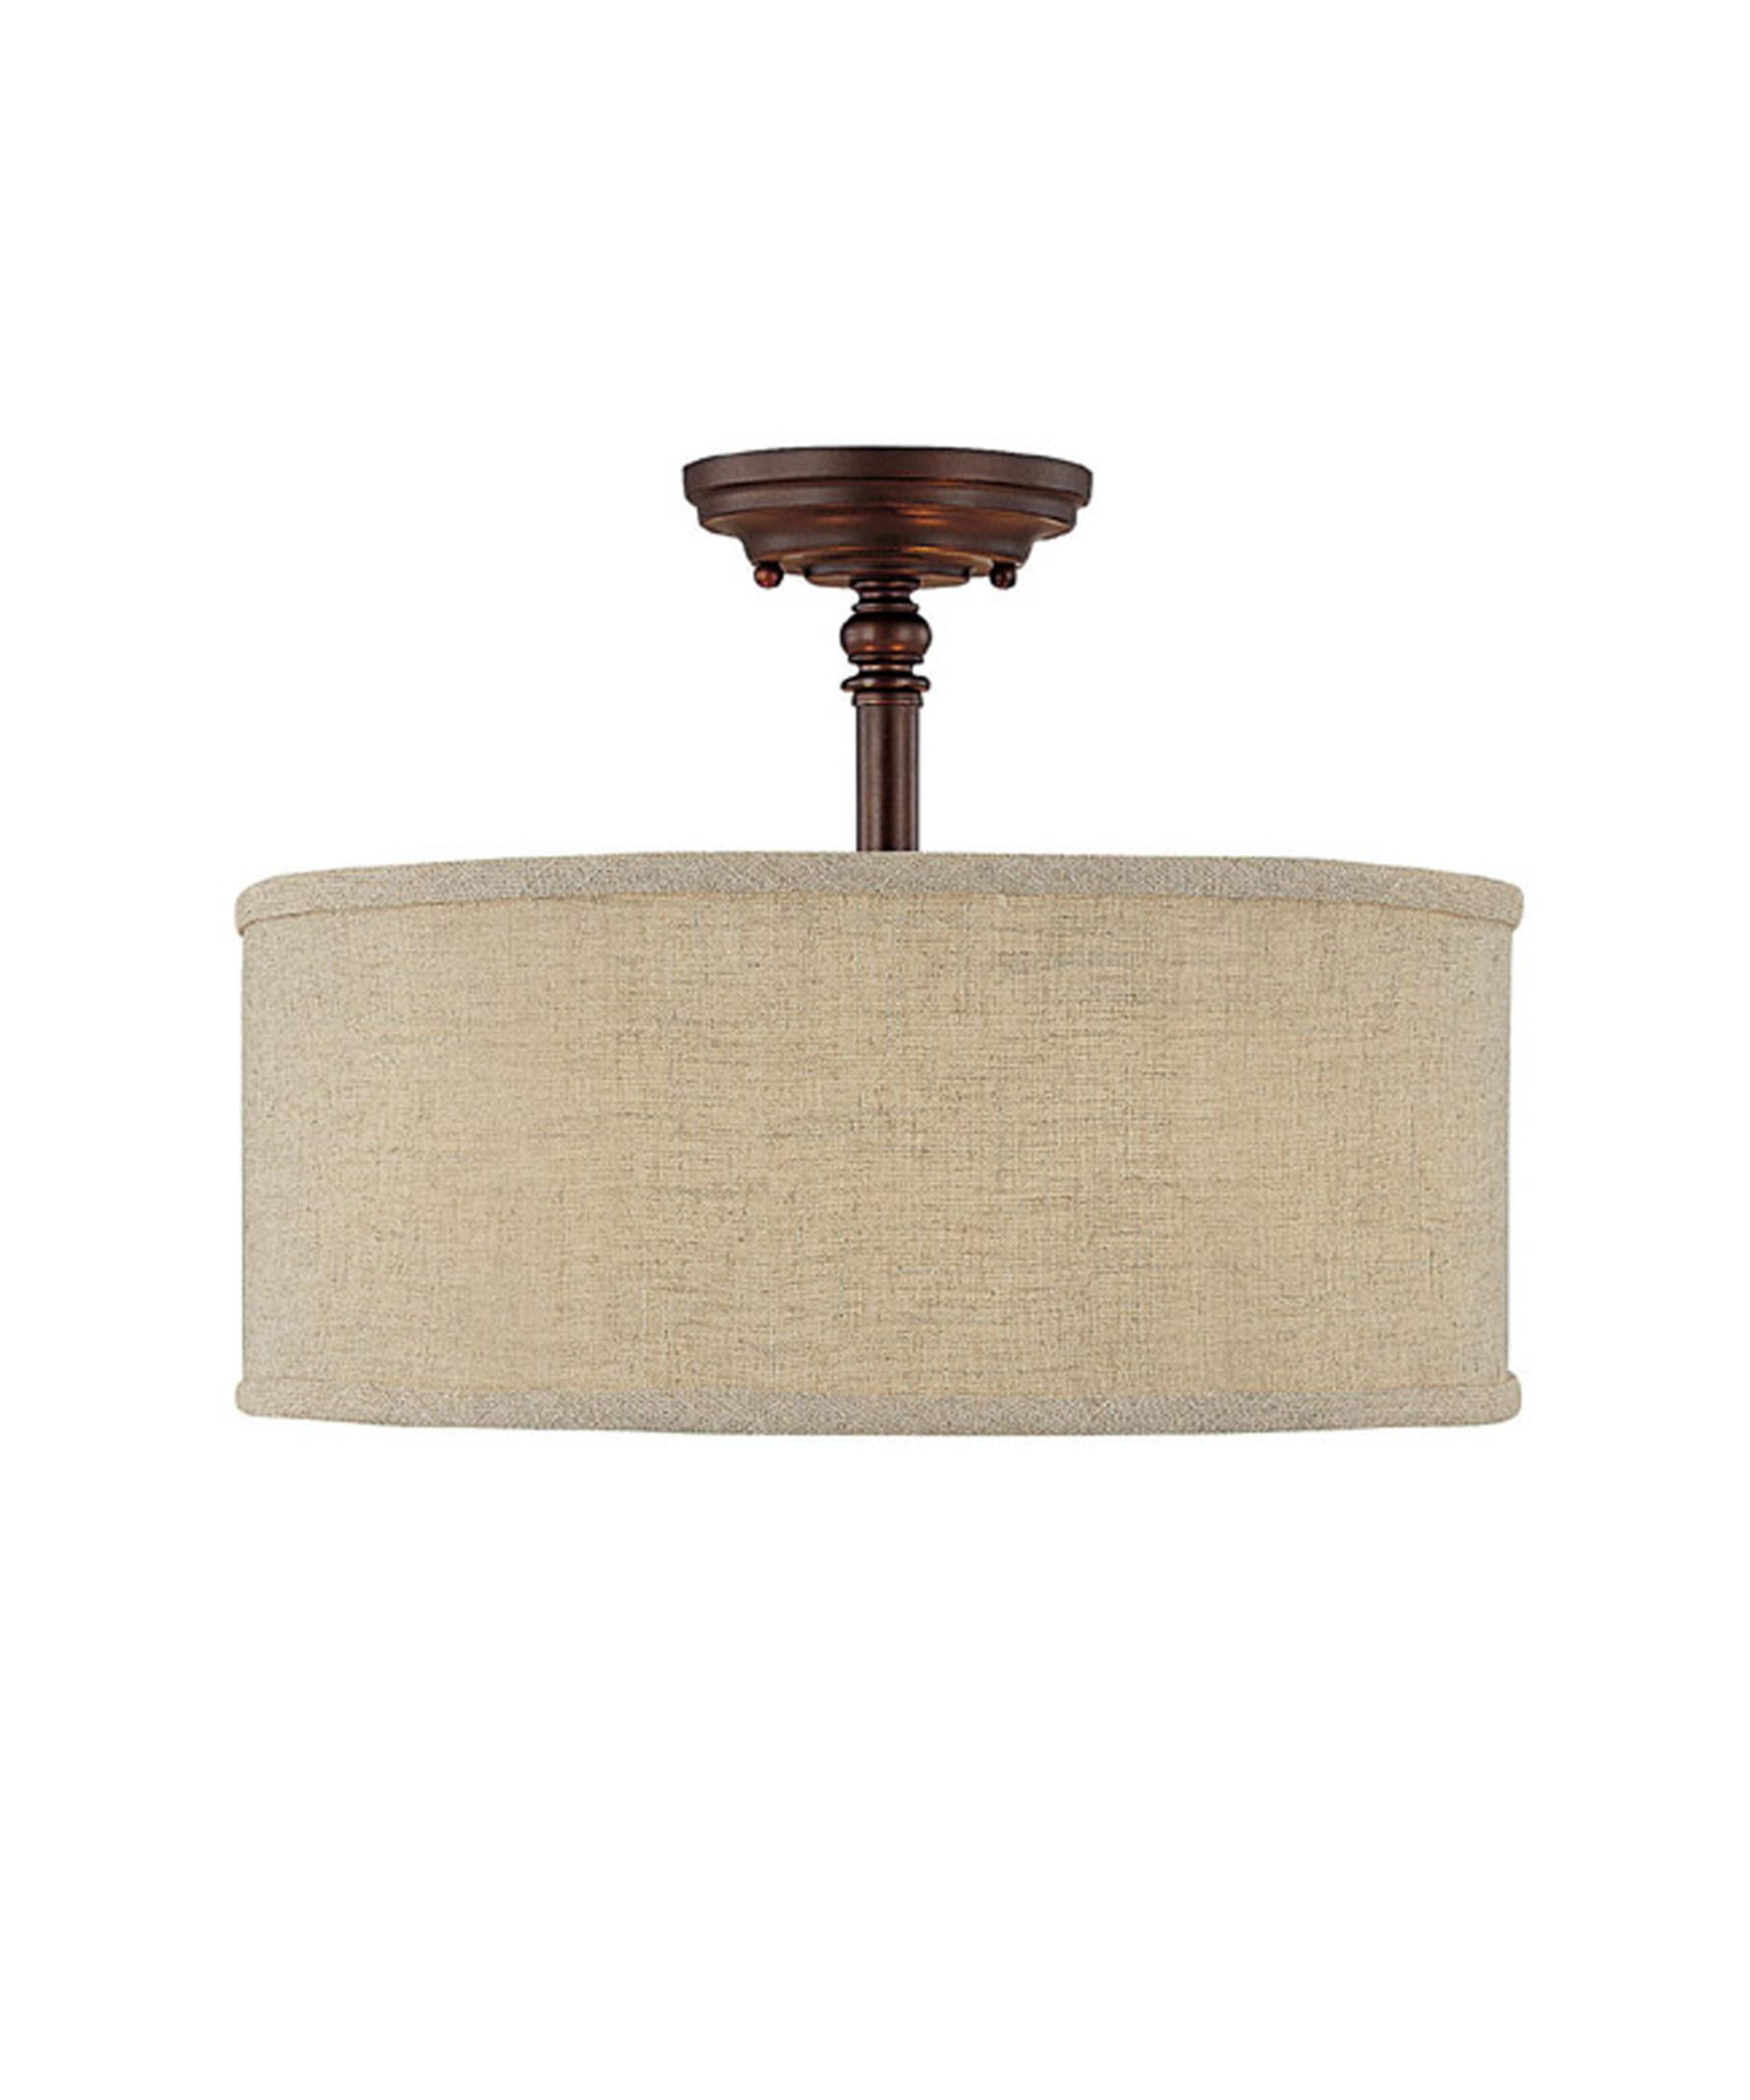 capital lighting loft 15 inch wide semi flush mount capitol lighting - Capital Lighting